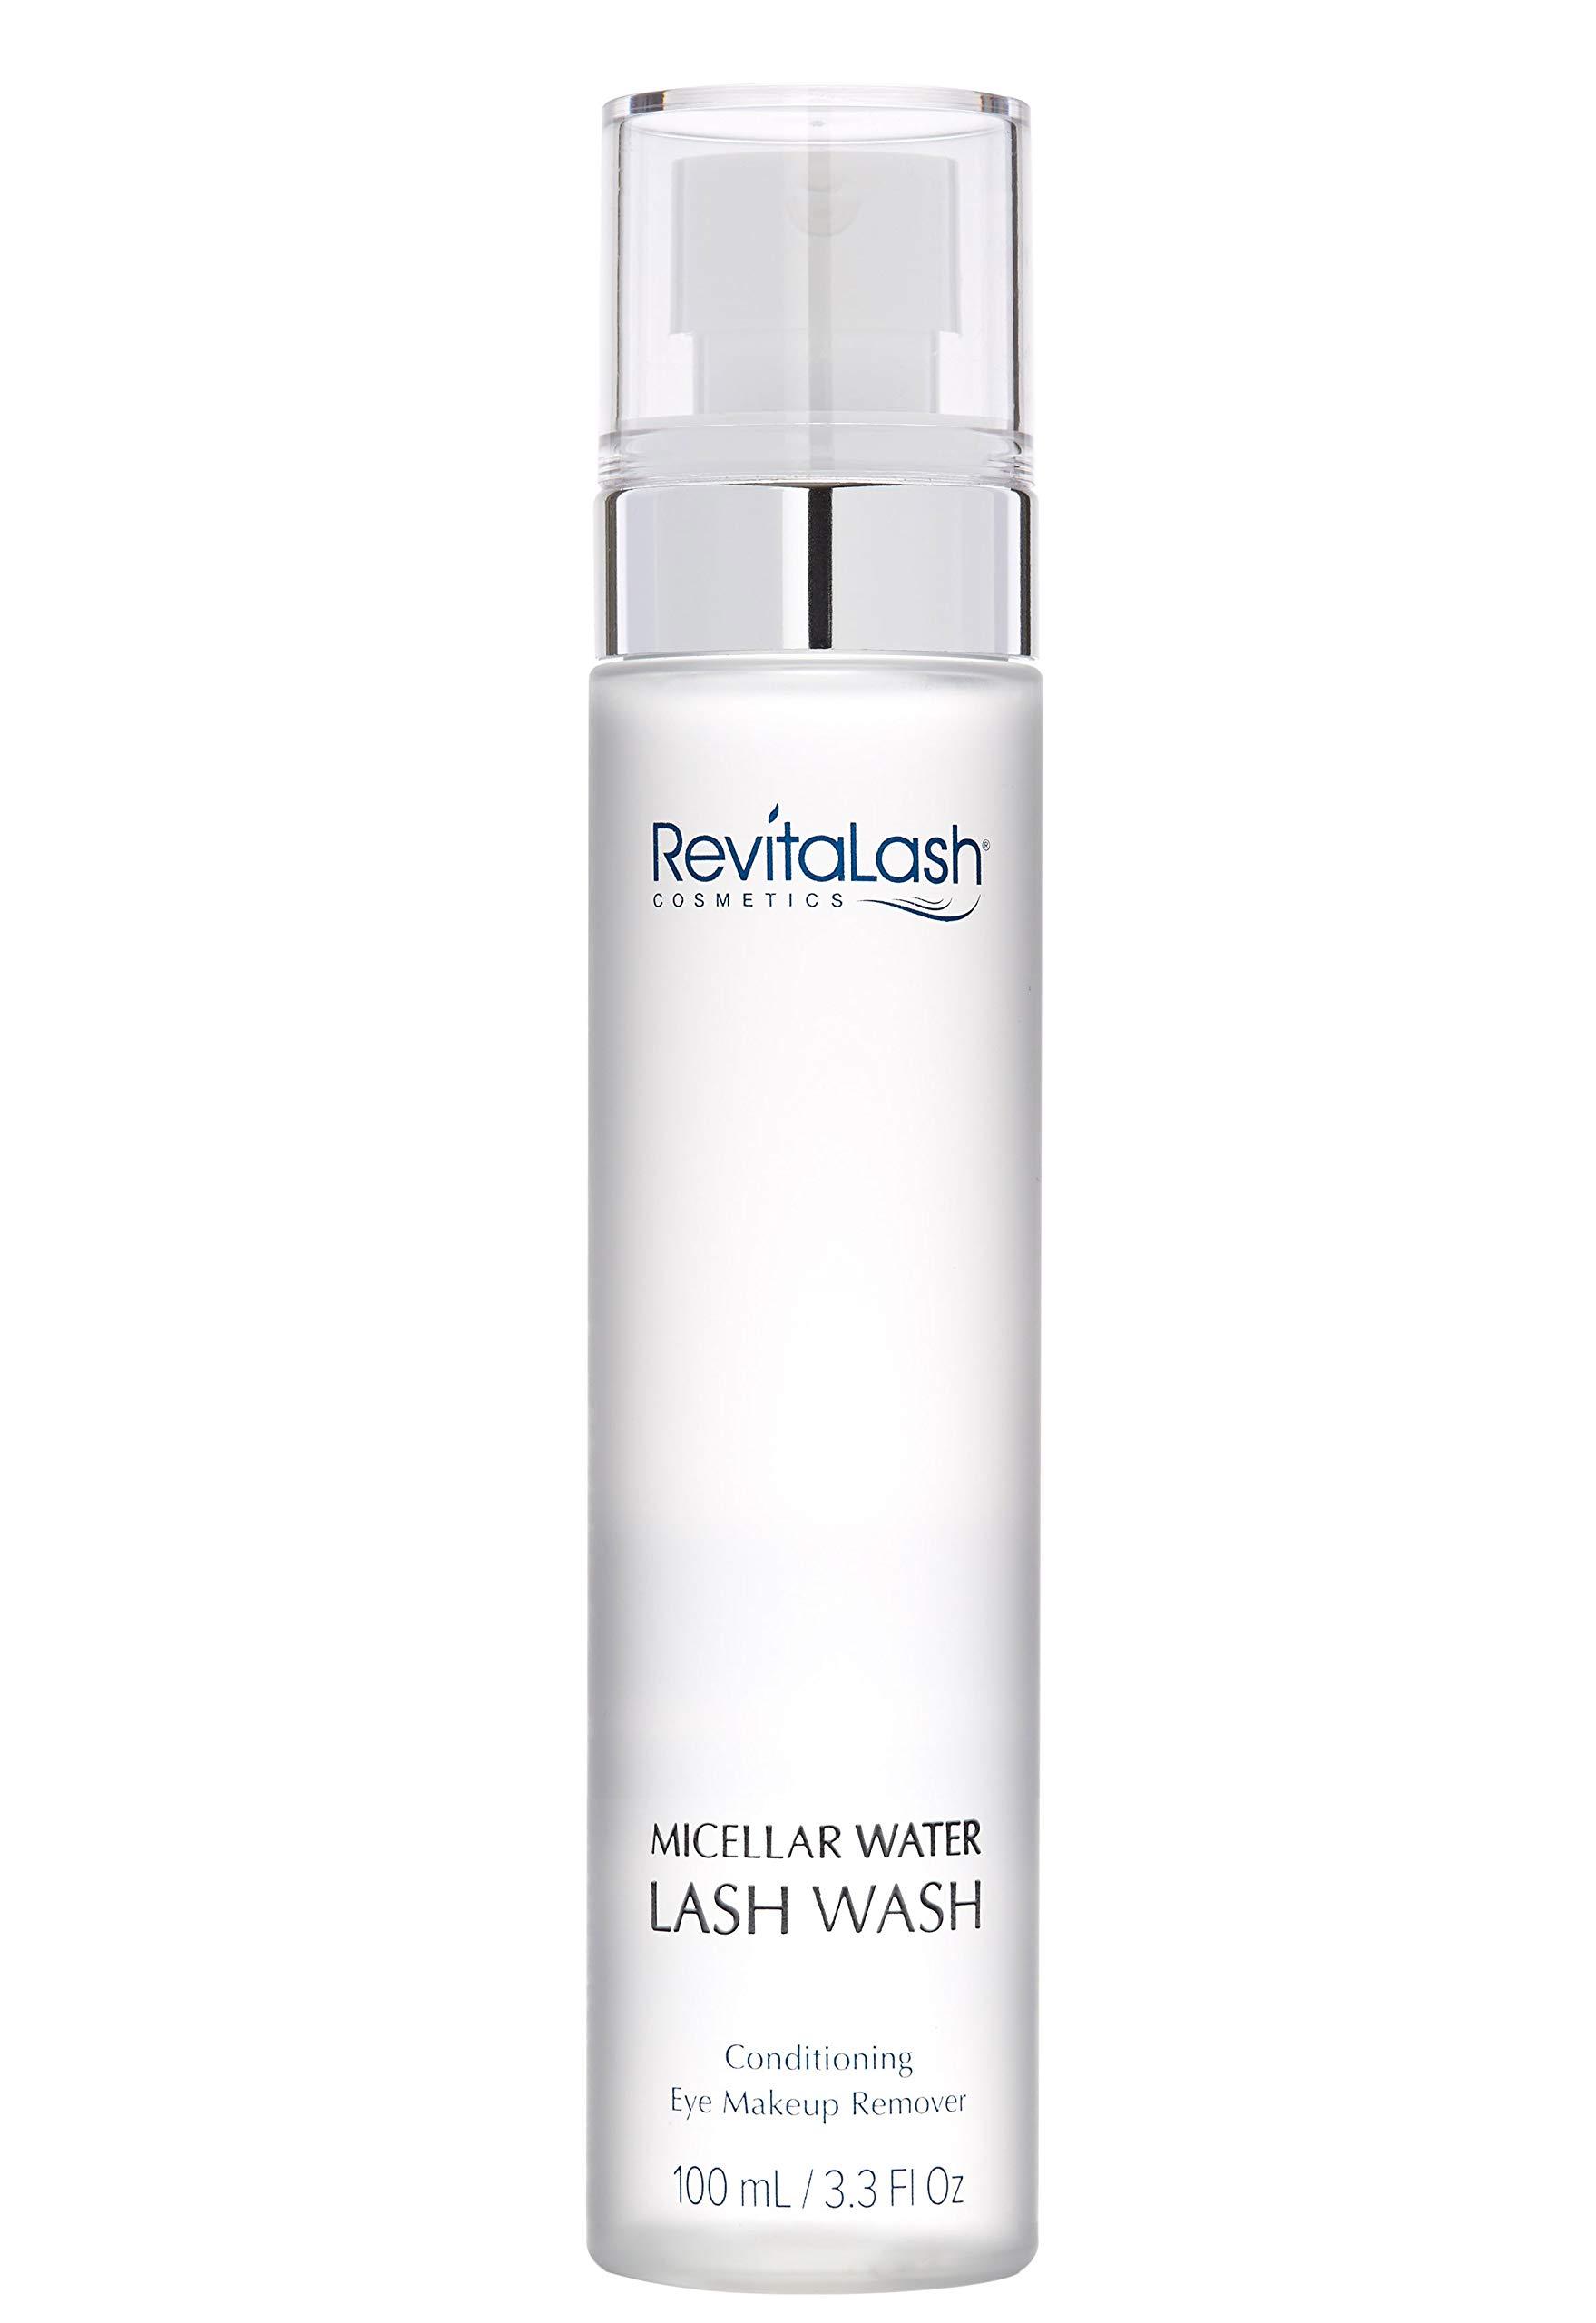 RevitaLash Cosmetics, Micellar Water Lash Wash - Conditioning Eye Makeup Remover, Hypoallergenic & Cruelty Free by RevitaLash Cosmetics